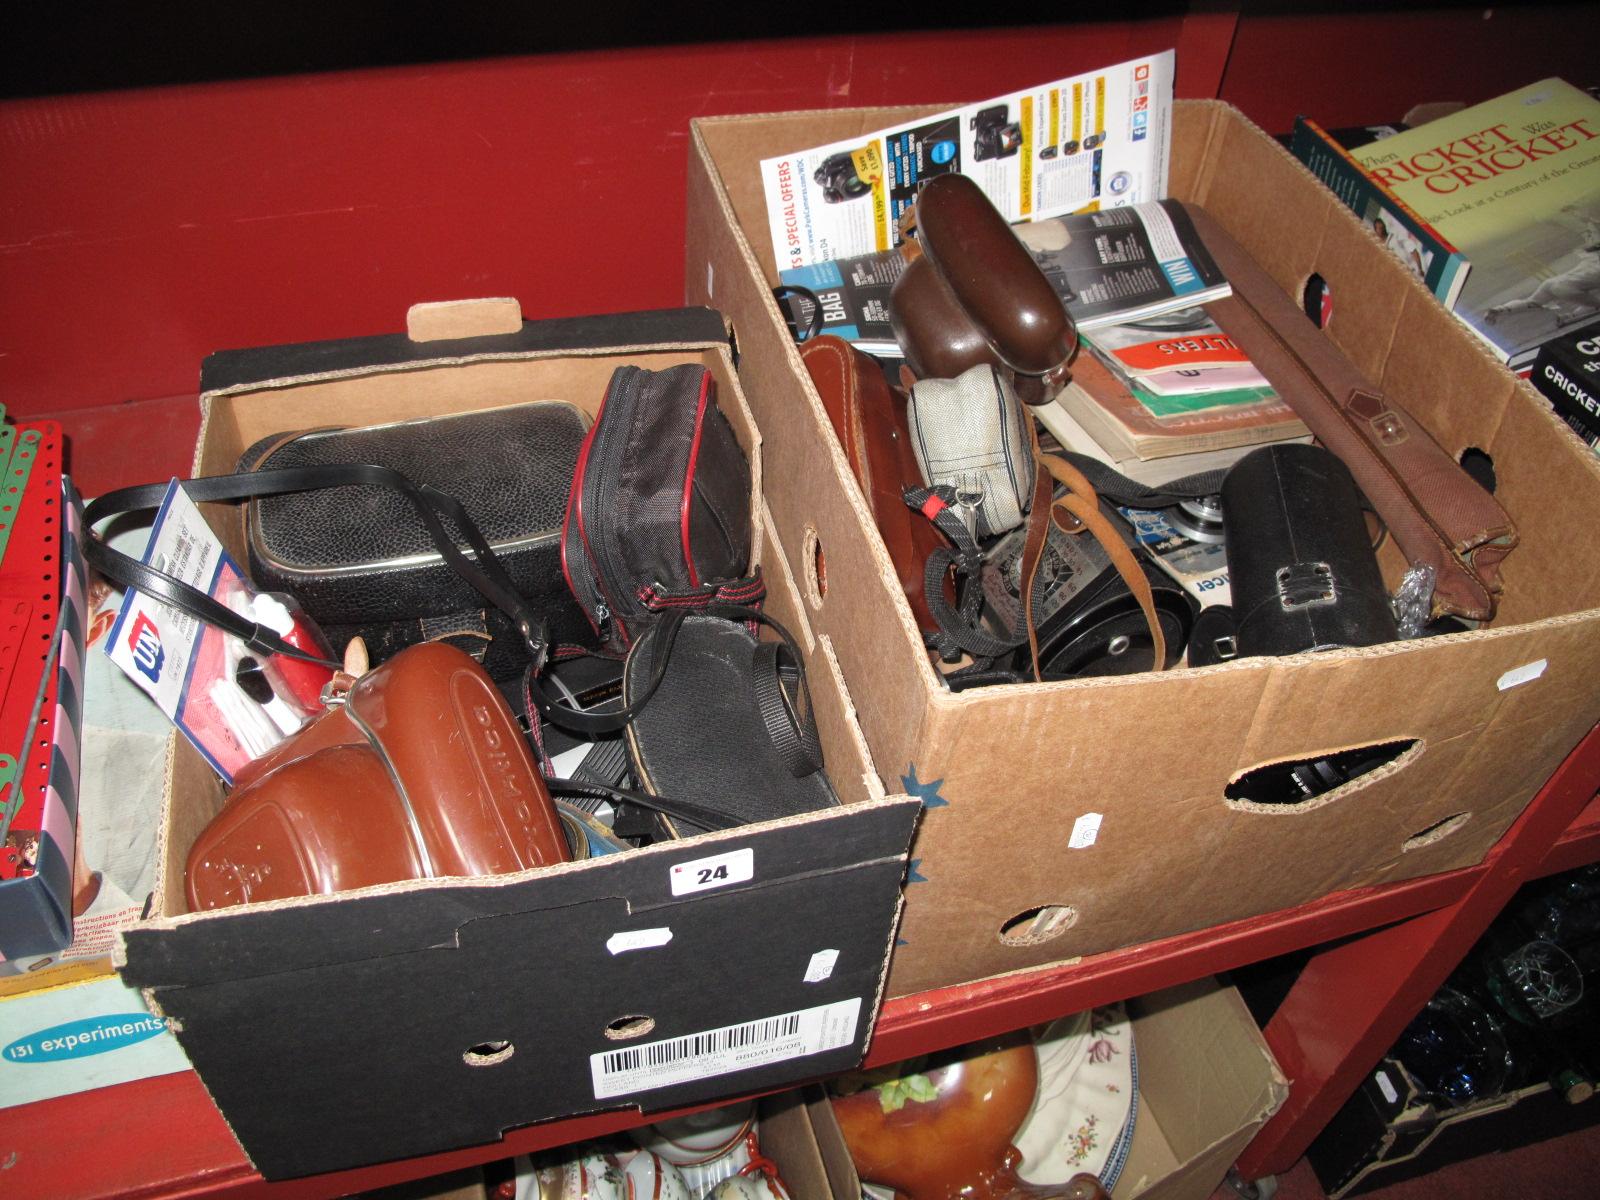 Lot 24 - Binoculars - Prinzulux 8x30, cameras, Praktica VF, IV, Voigtlander Vitoret, etc, lenses - vivitar